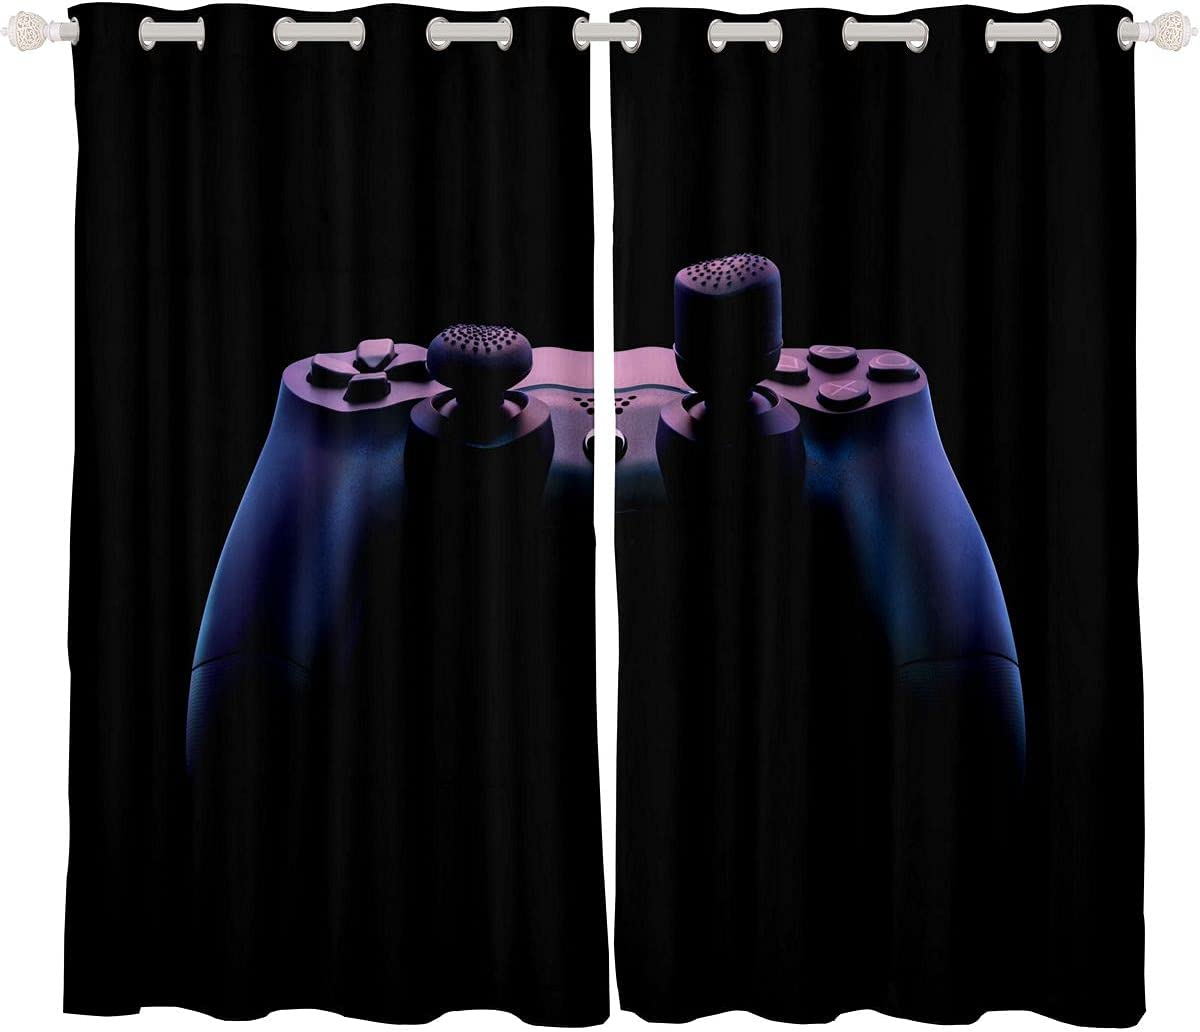 Feelyou Gamer Curtains 2 Panels Set 52W Vi x Teens 着後レビューで 送料無料 至上 Inch 63L Boys